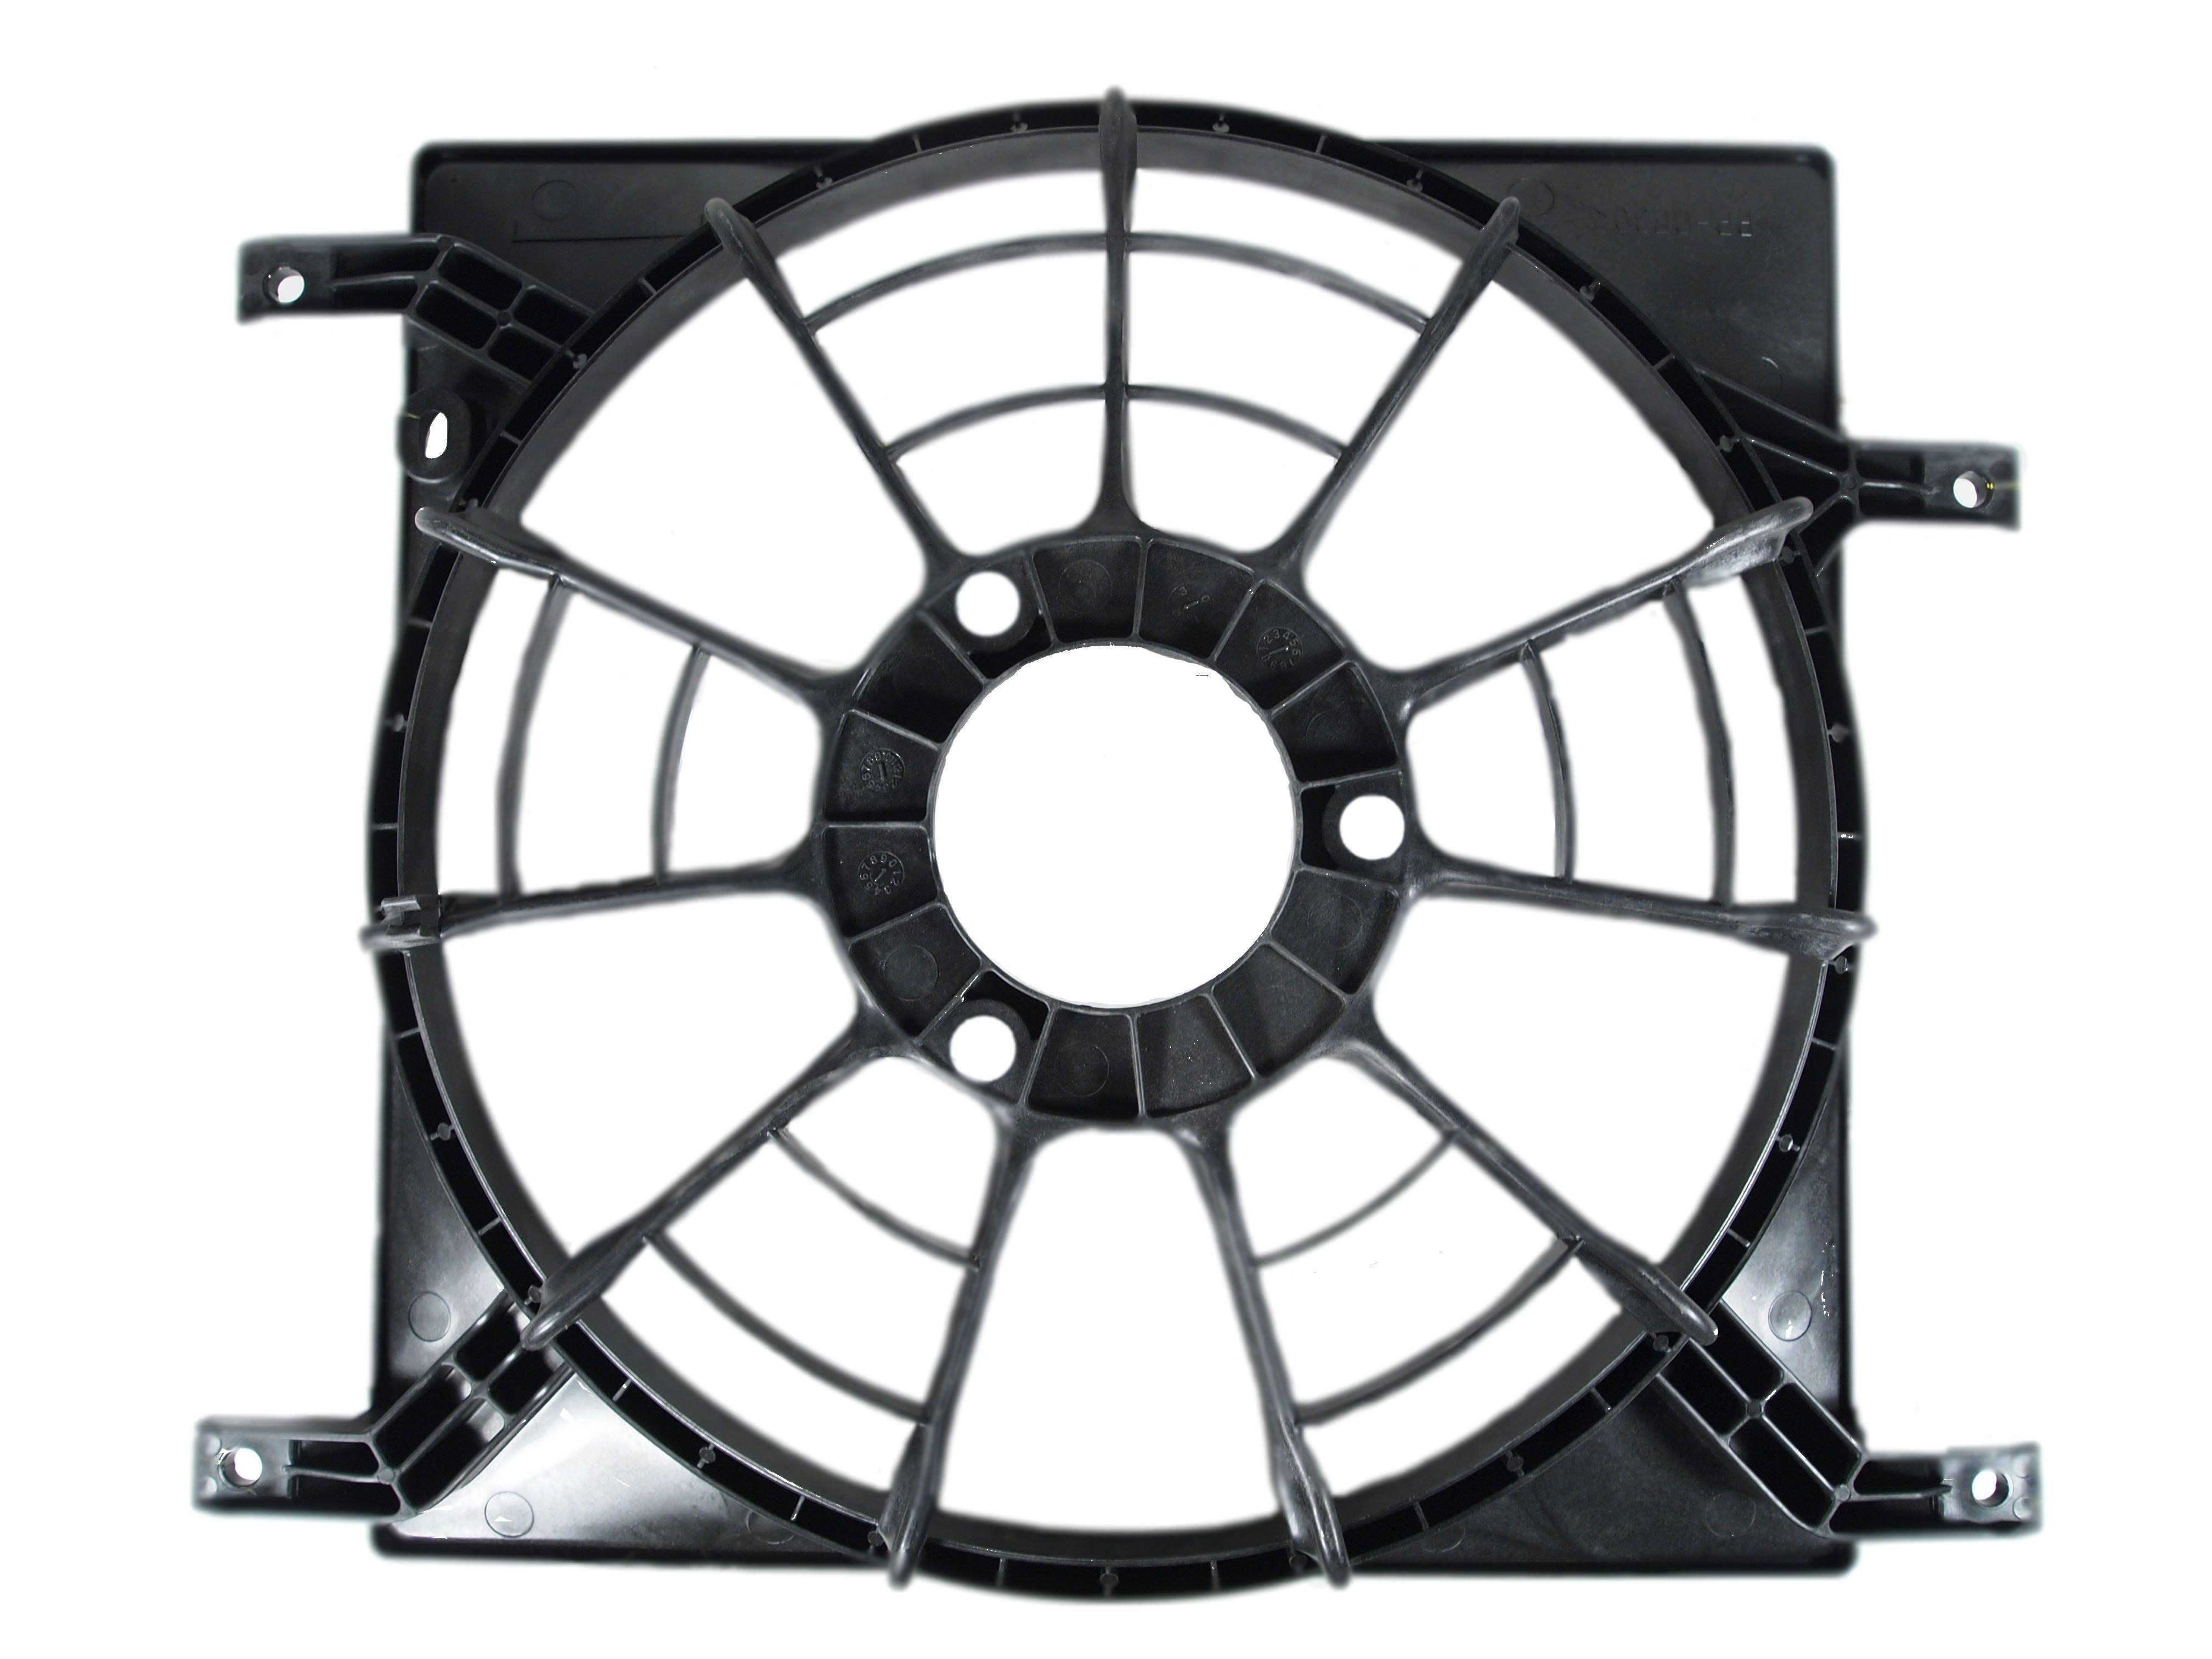 Кожух вентилятора охлаждения (диффузор) Suzuki Swift III [1776080ja0] от Ravta